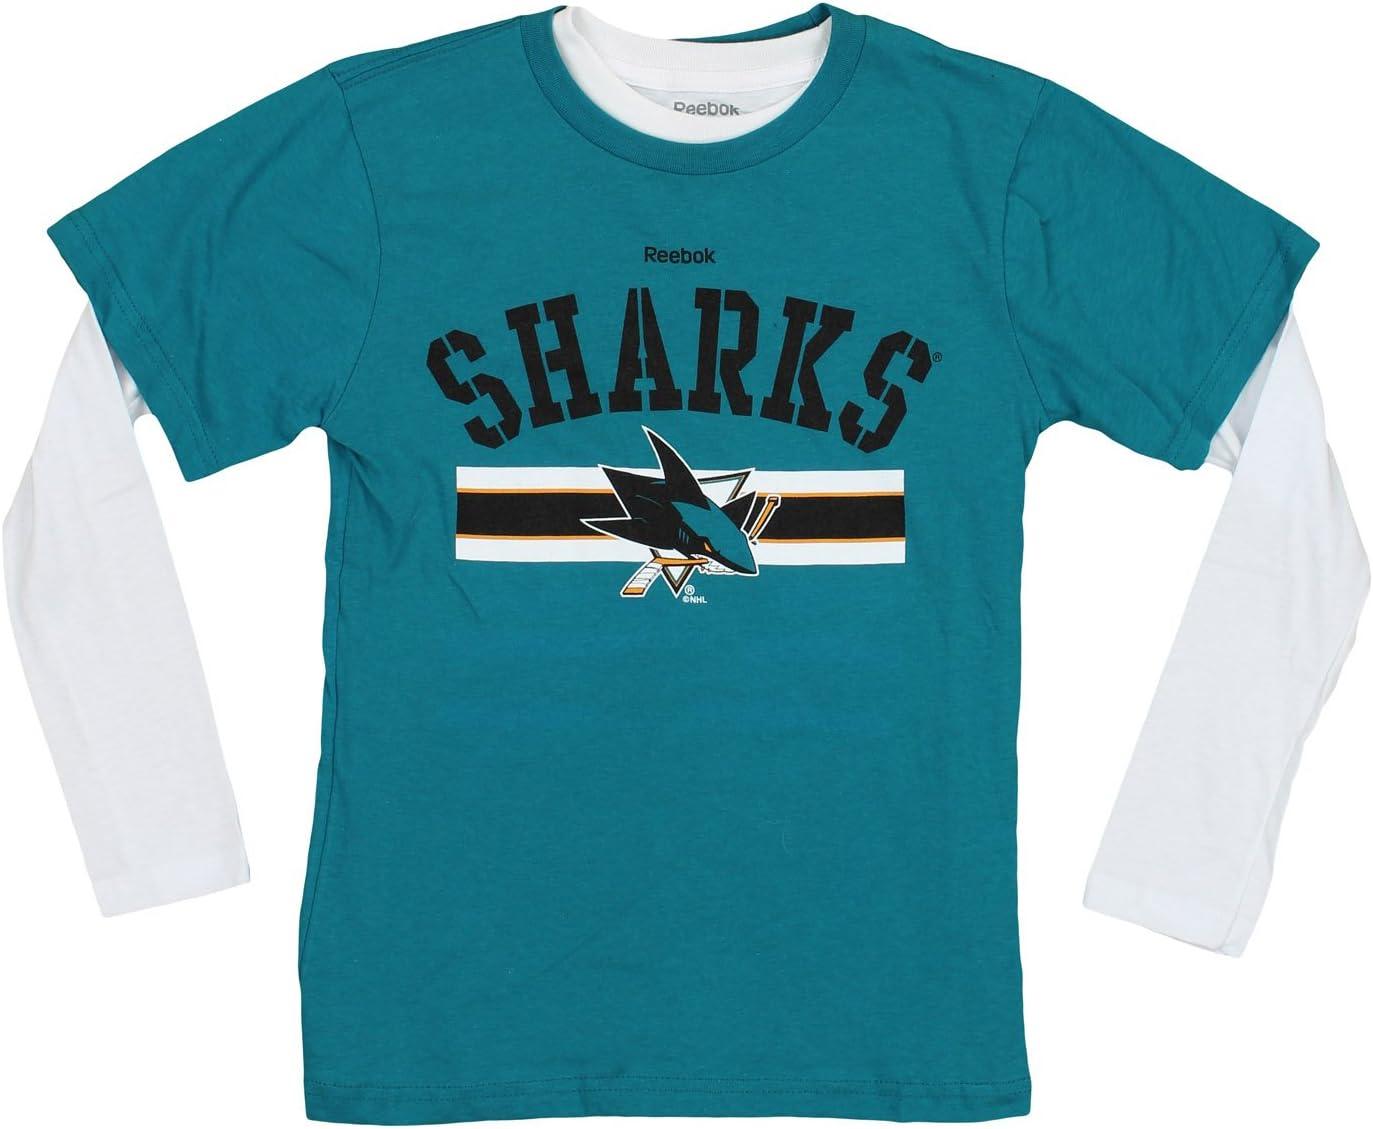 Reebok NHL Boys Youth Kids Hat Trick 2 Piece Short Sleeve & Long Sleeve T-Shirt Combo Pack